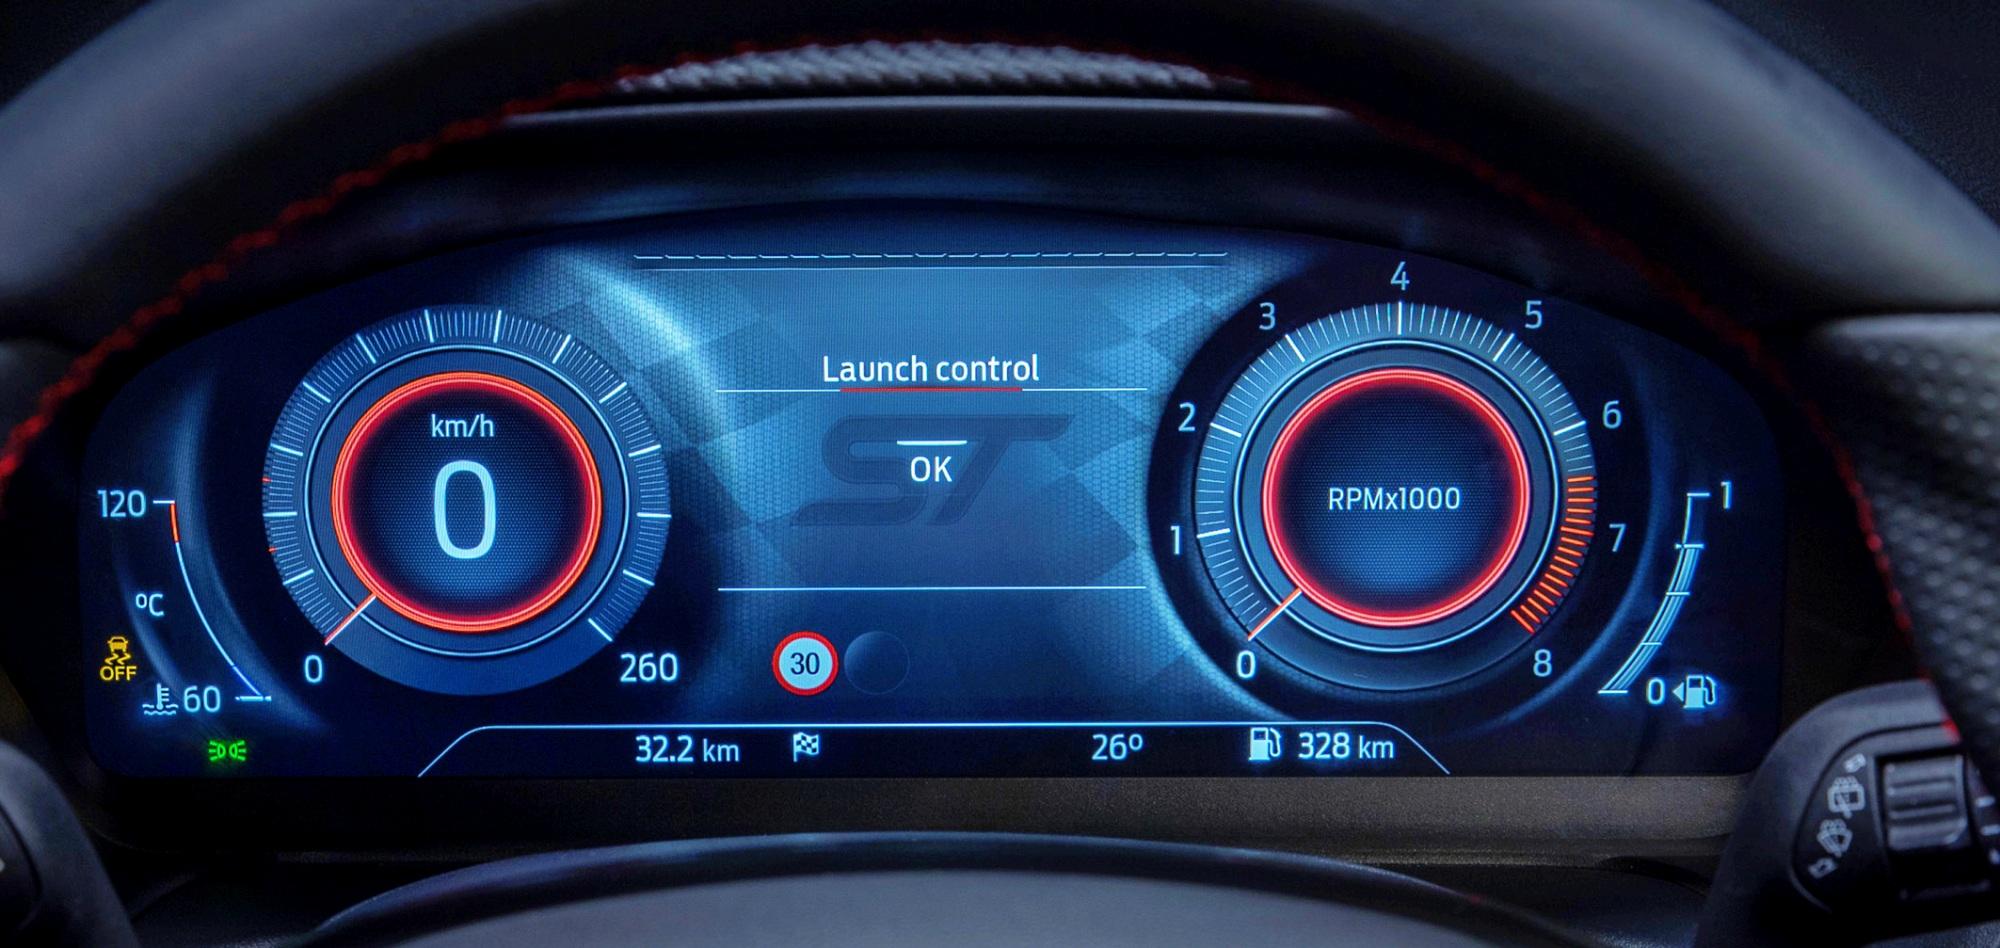 Ford Fiesta wskaźniki